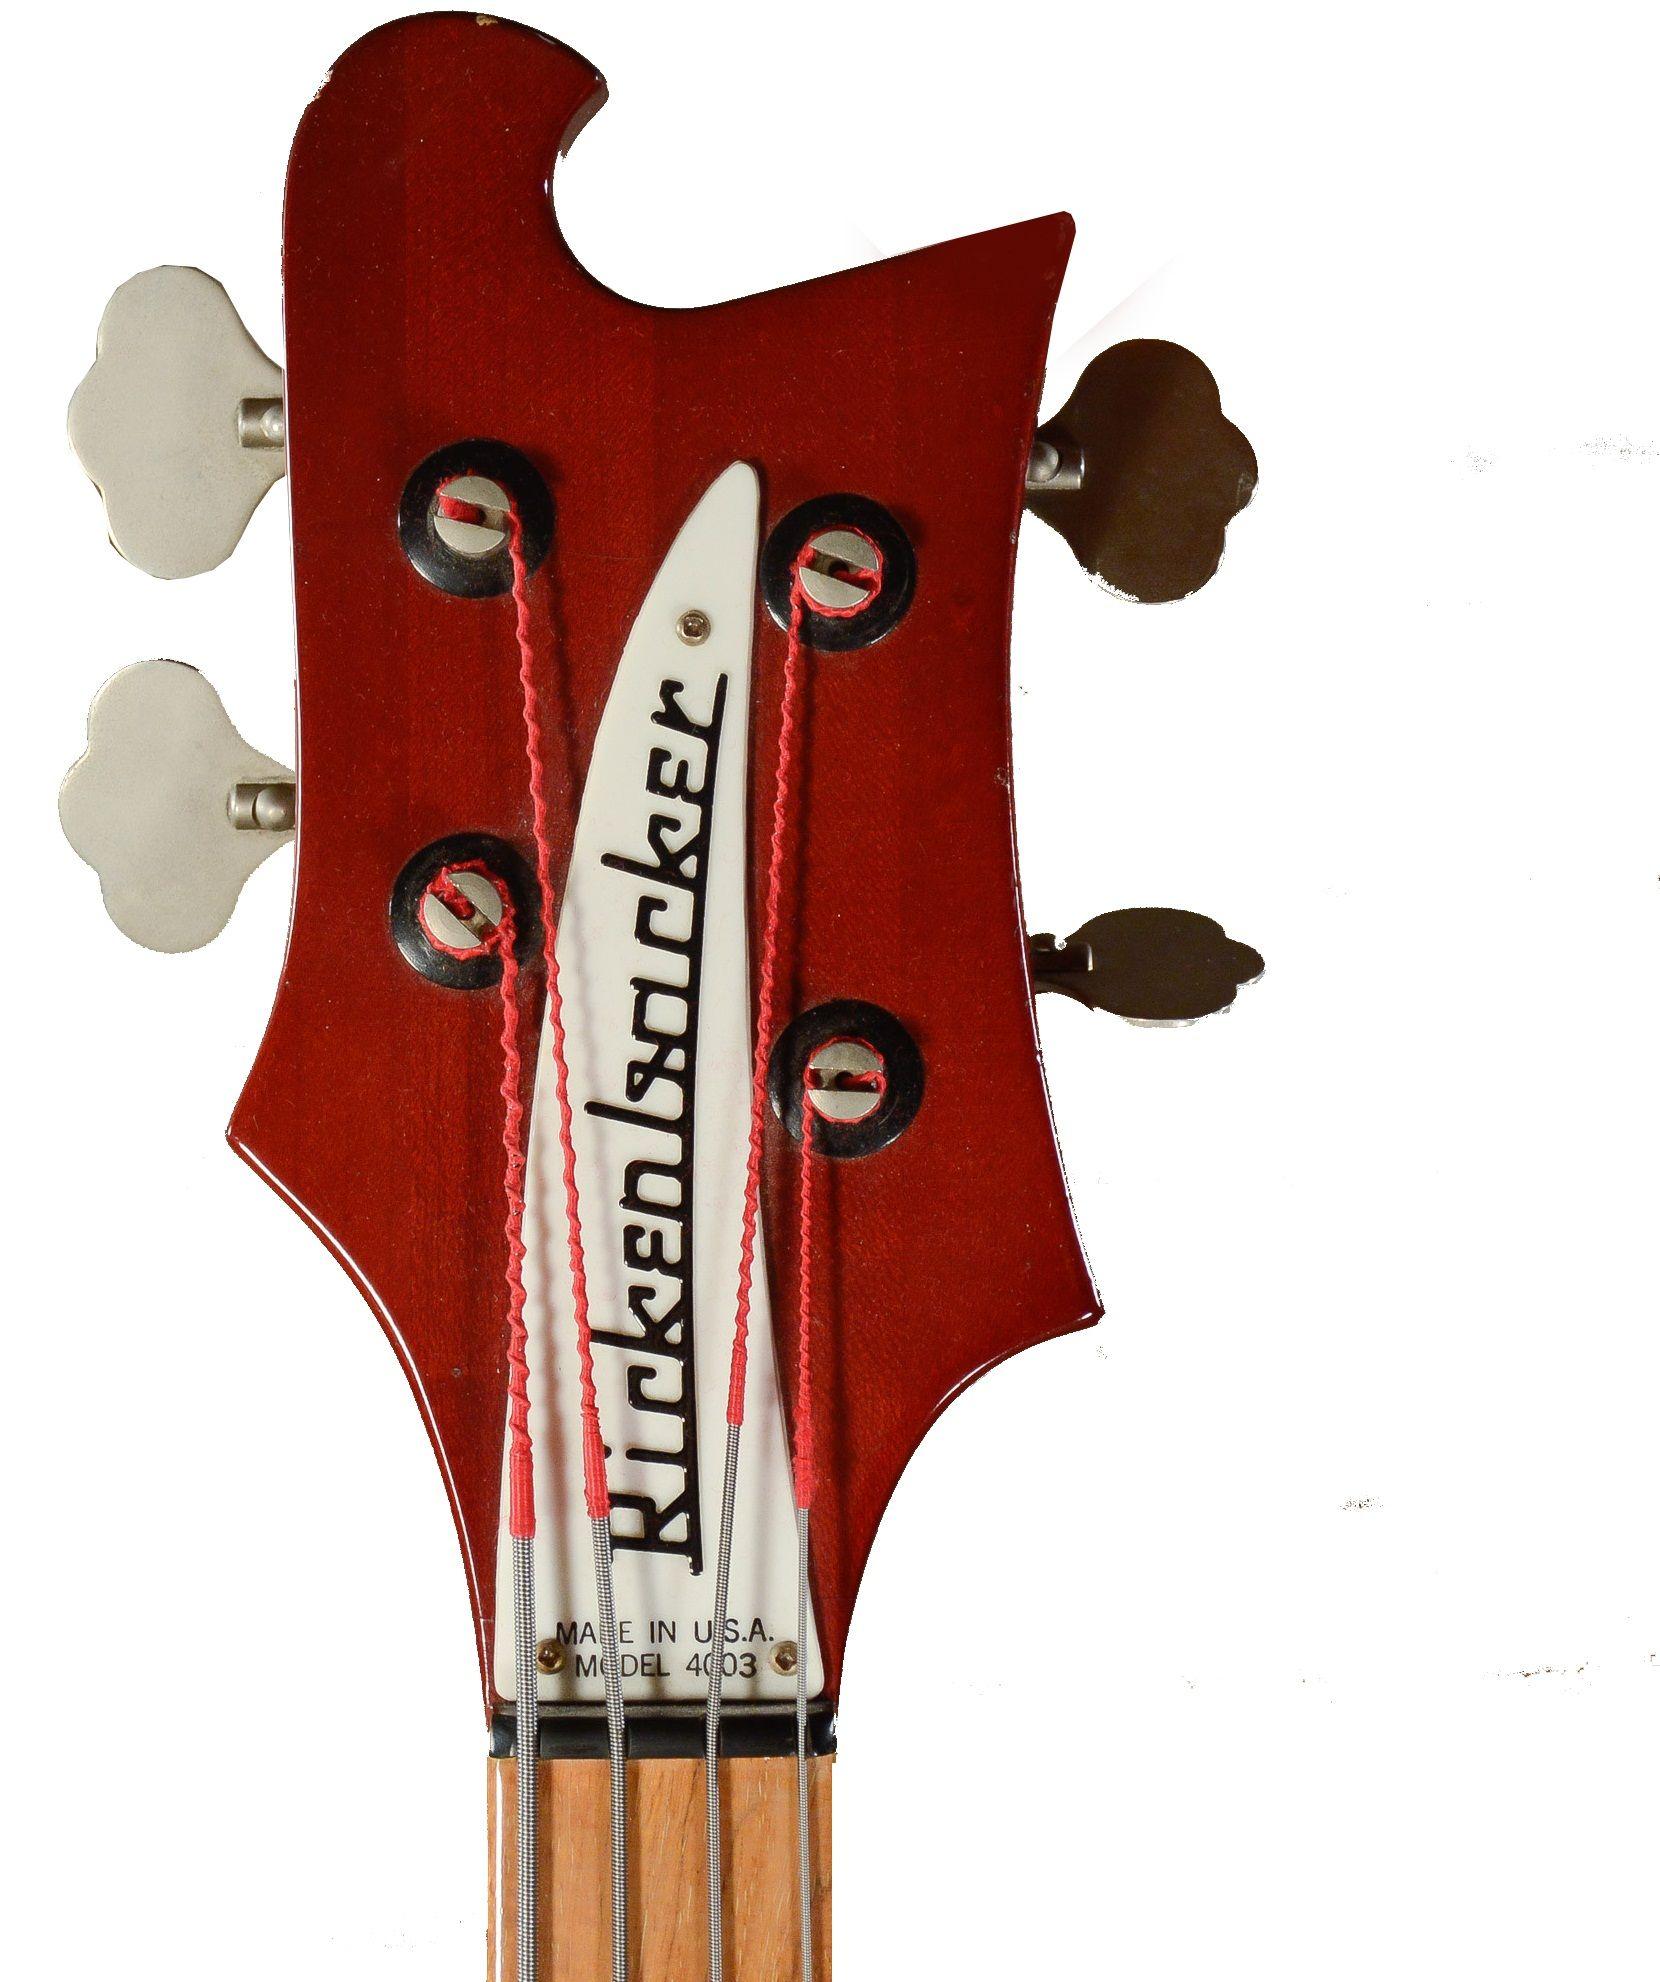 Rickenbacker 4003S Bass Guitar in Ruby Guitar guy